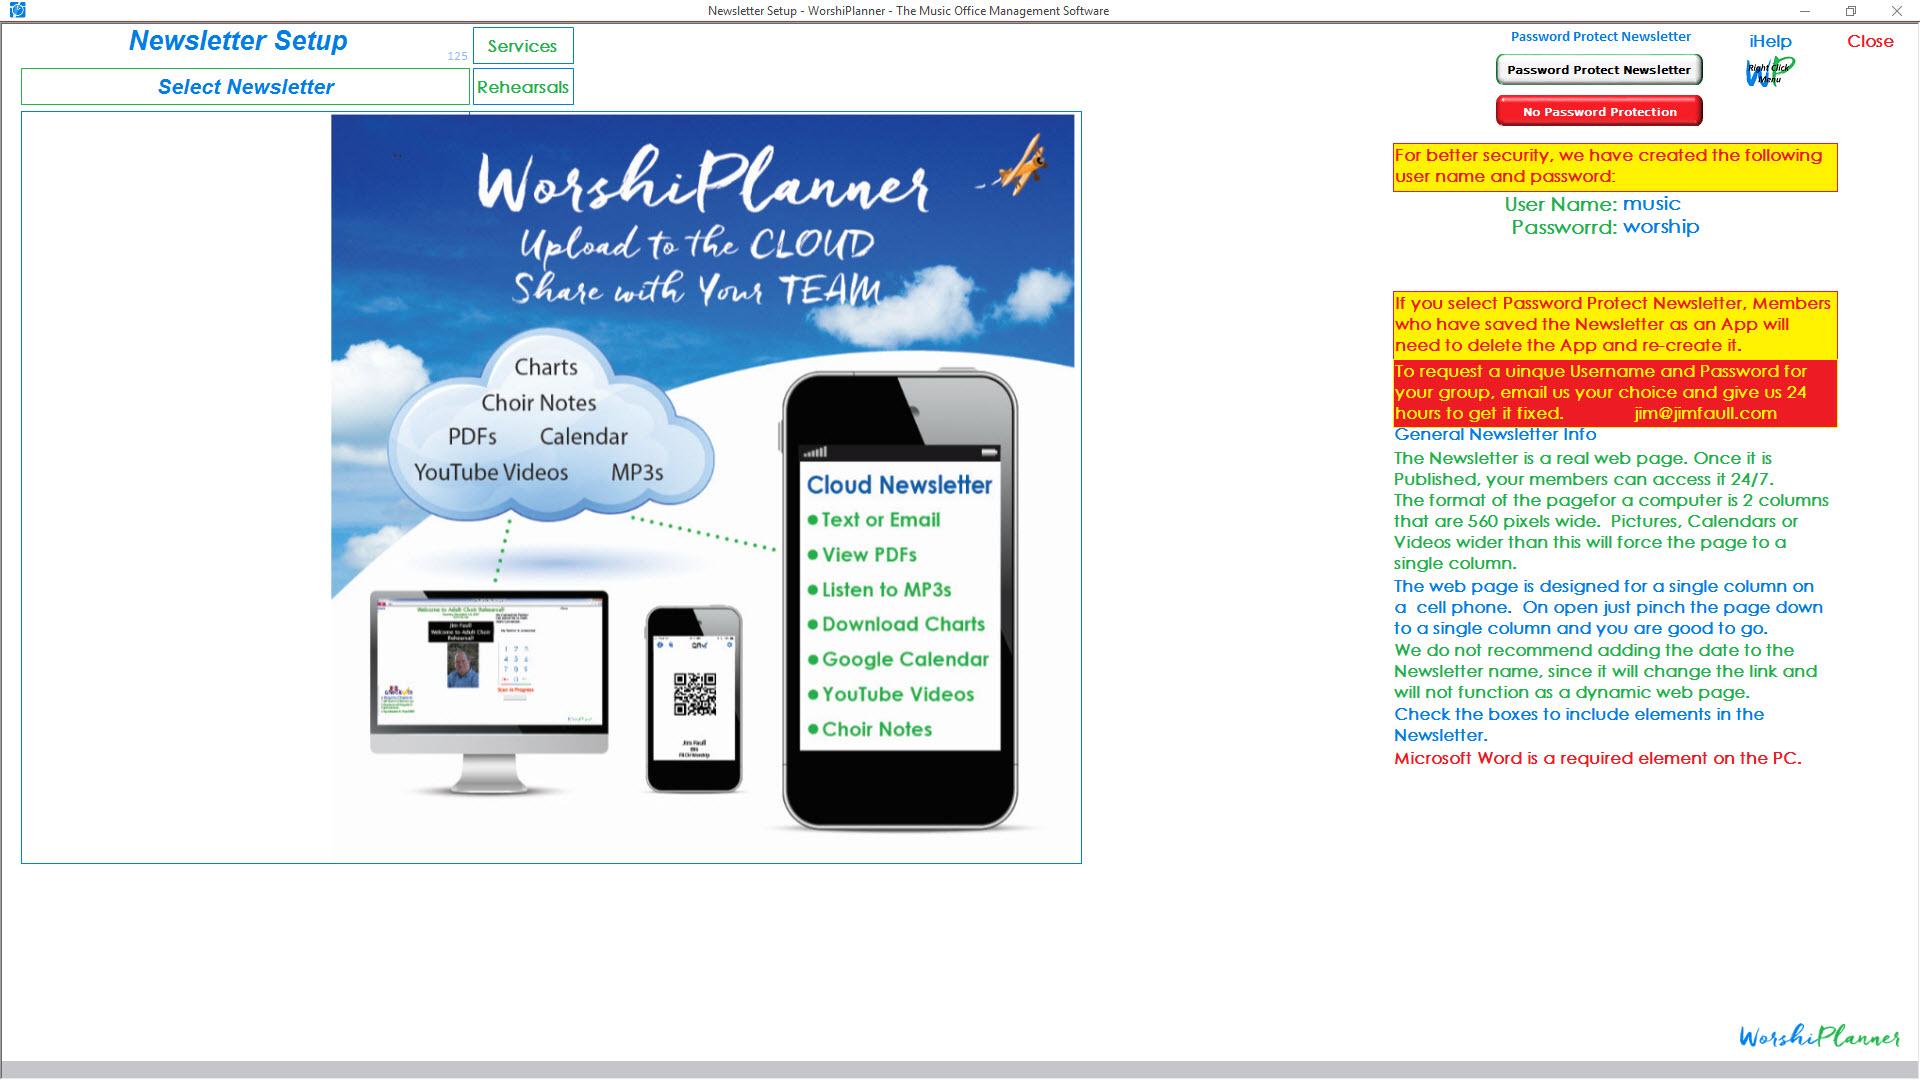 WP-News-Setup